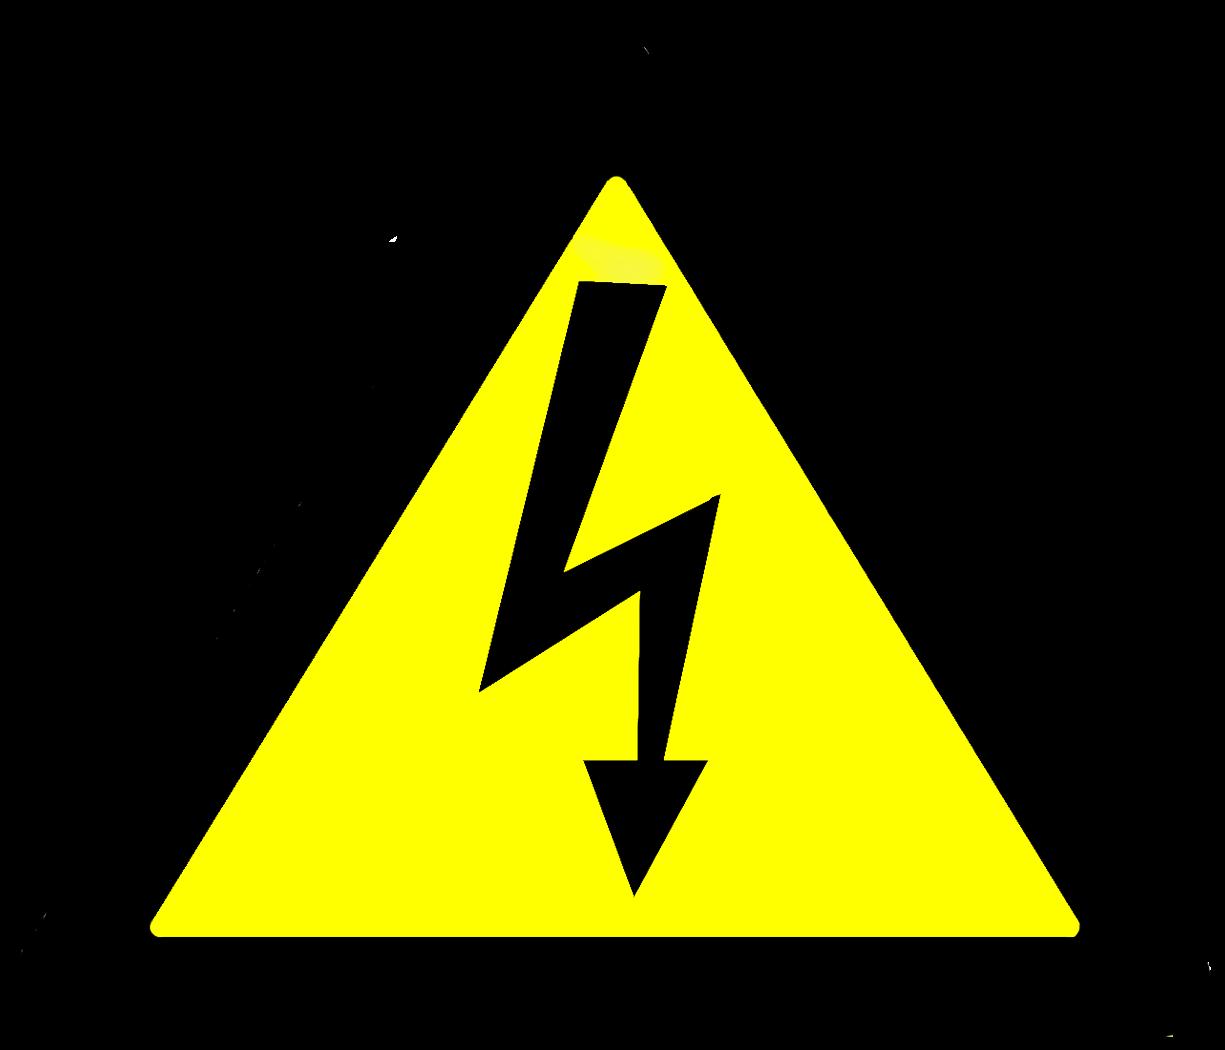 Светодиодный Модуль Rgb – Купить Светодиодный Модуль